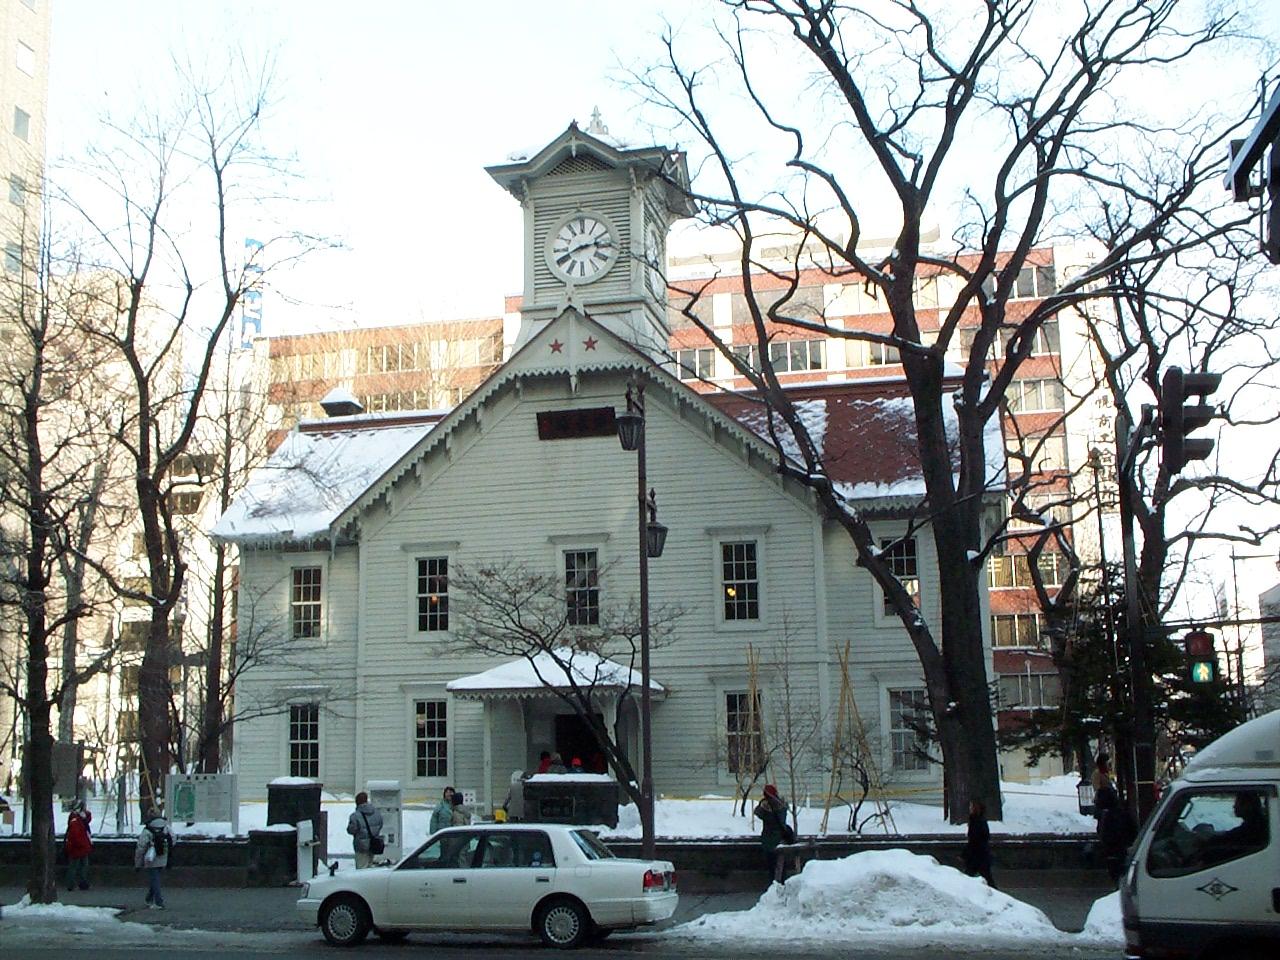 File:Sapporo clock tower.JPG - Wikimedia Commons